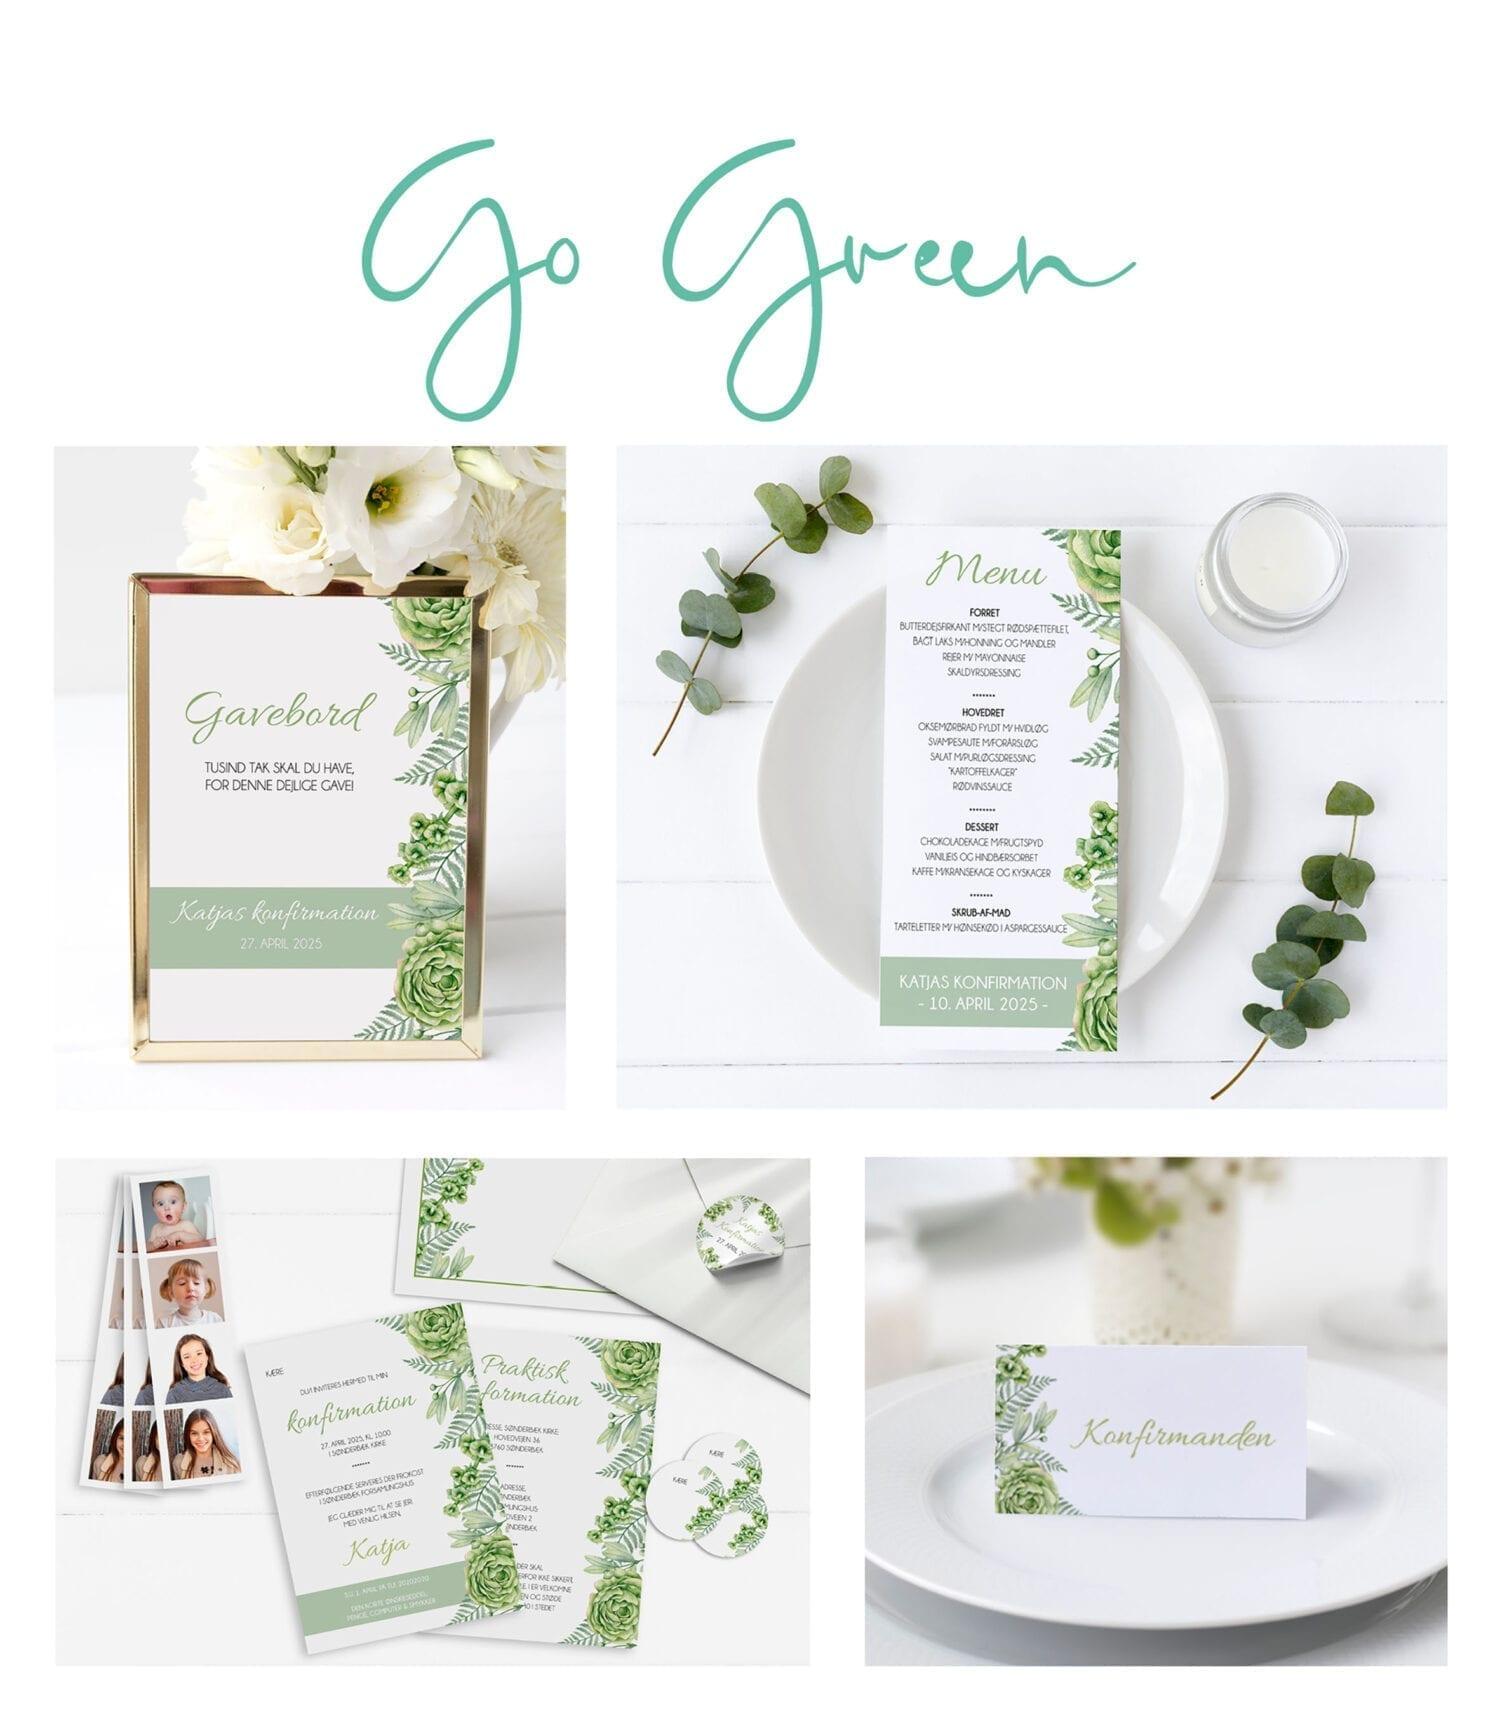 Konfirmation invitation grøn natur eukalyptus